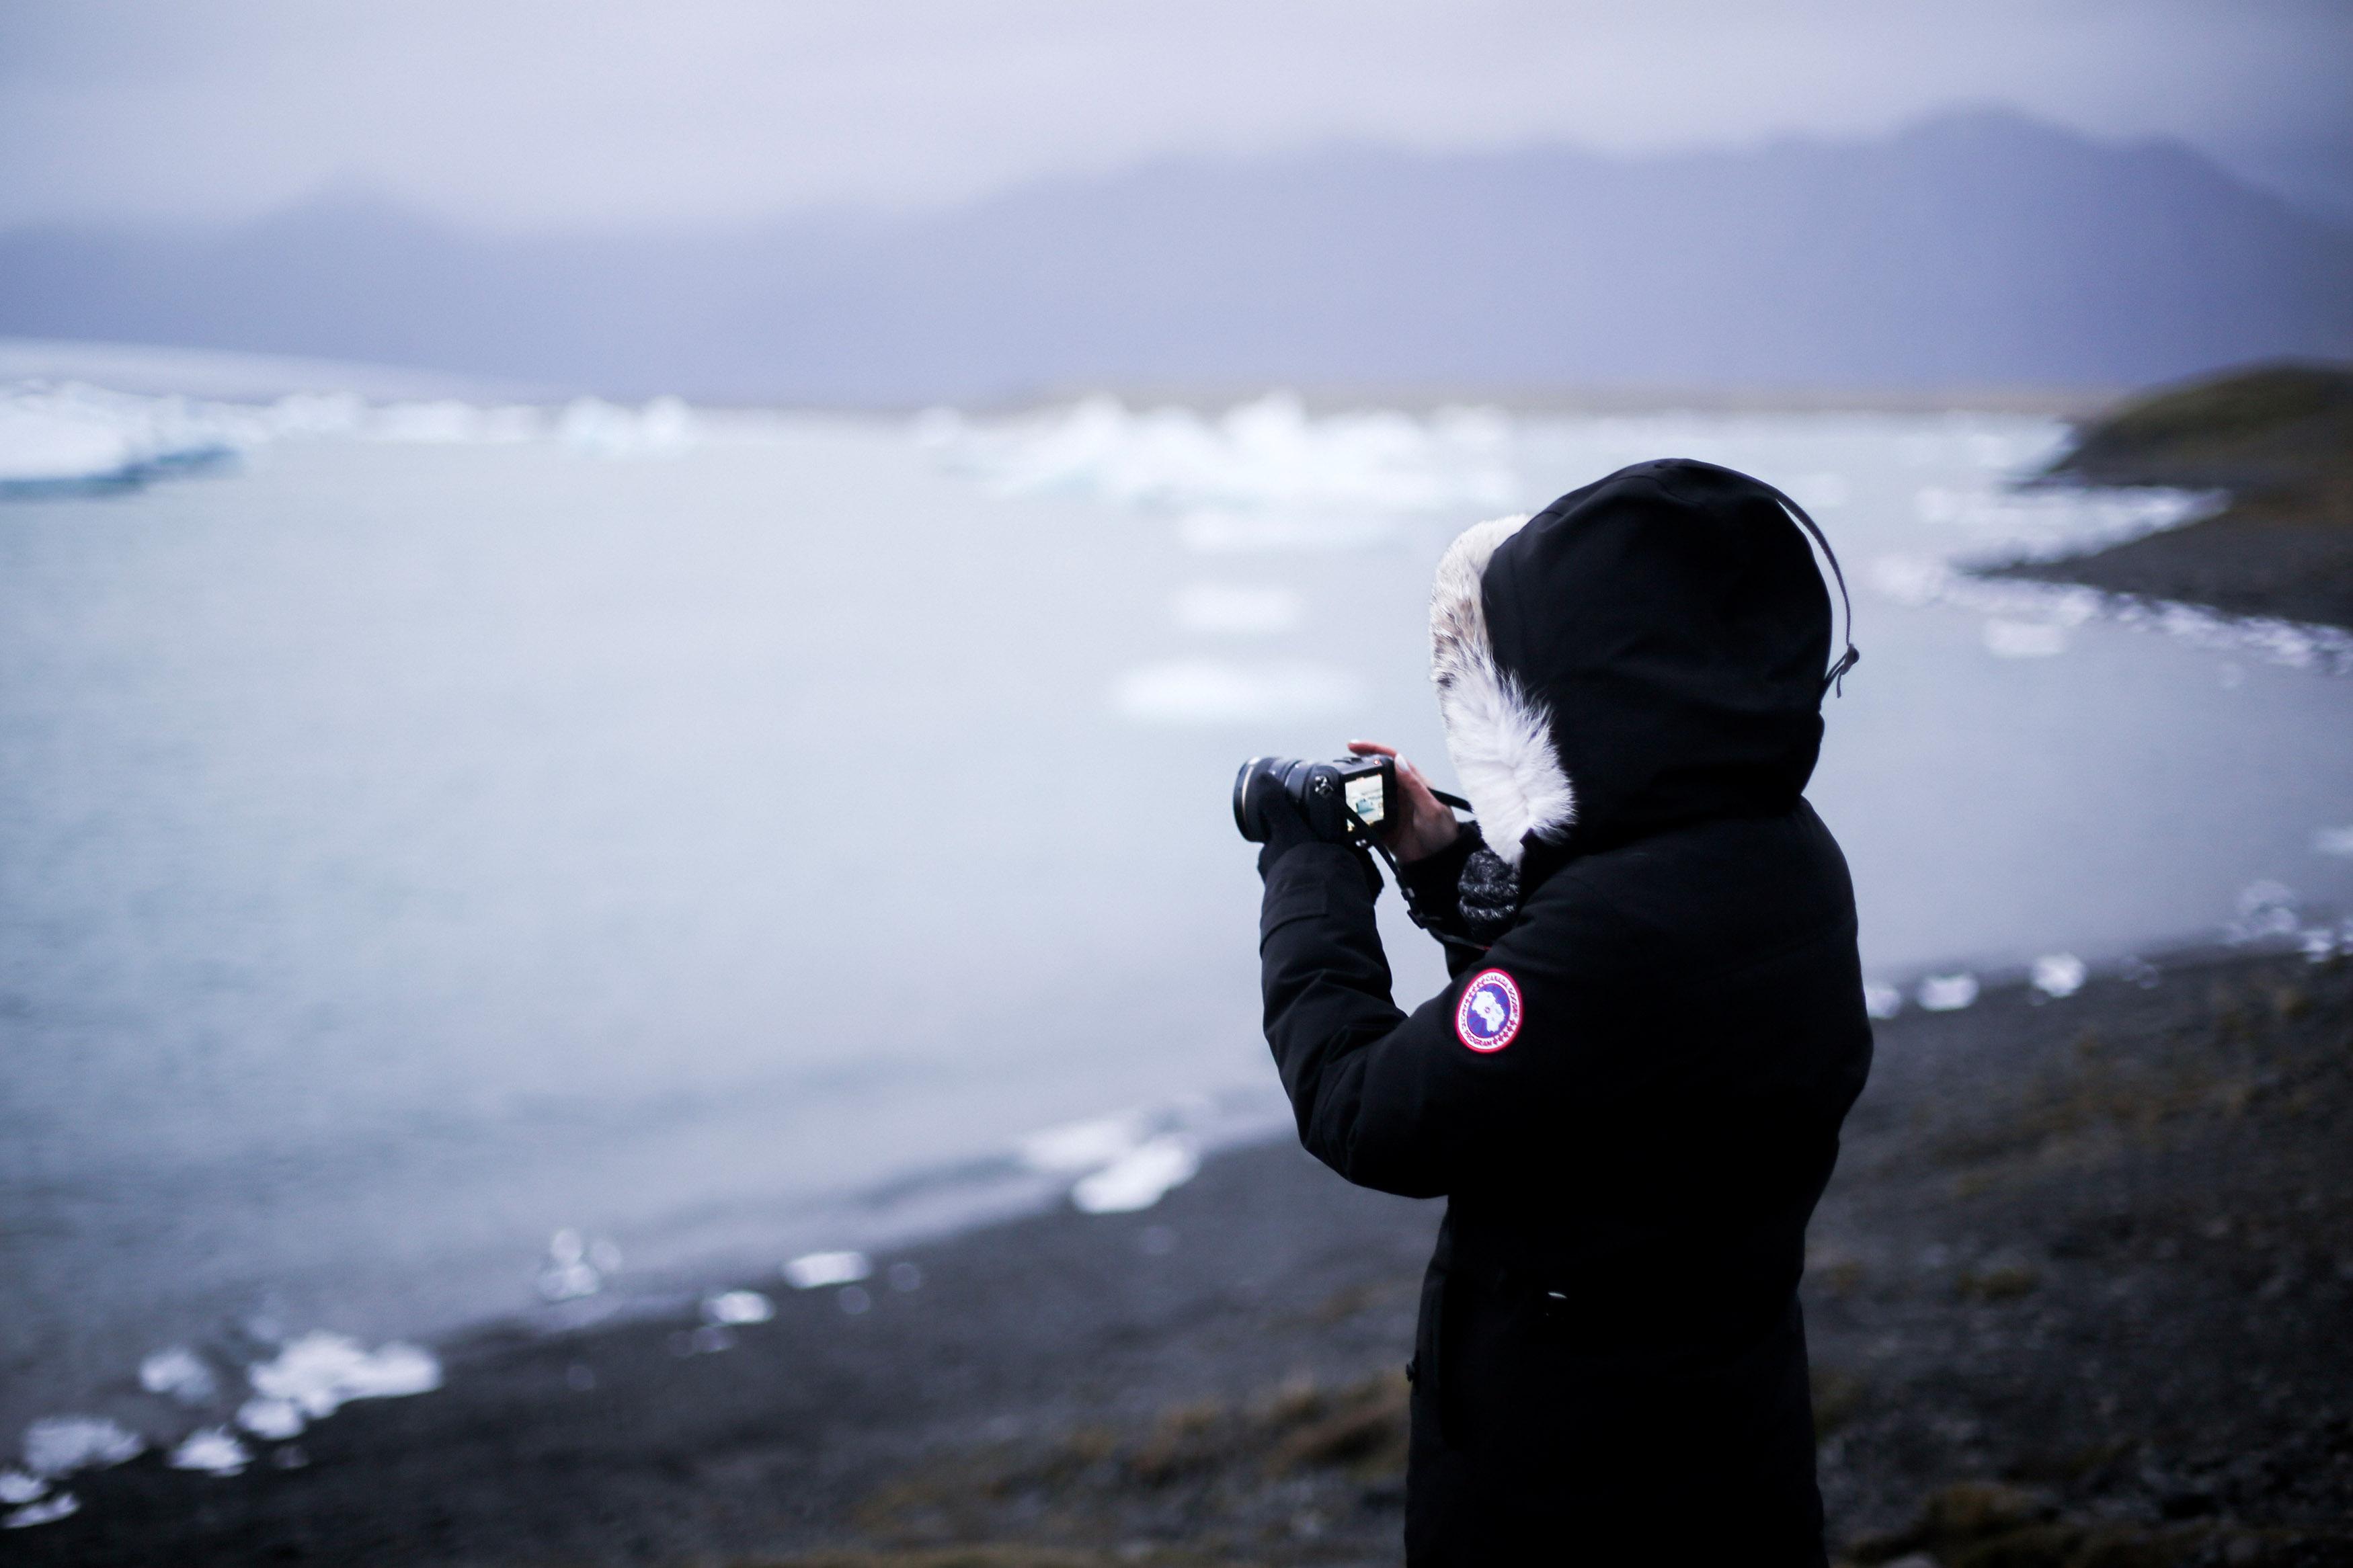 IHEARTALICE.DE – Fashion, Lifestyle & Travel-Diary by Alice M. Huynh from Berlin/Germany: Iceland Travel Diary / Jökusarlon – Glacier Lagoon/Glacier Sea